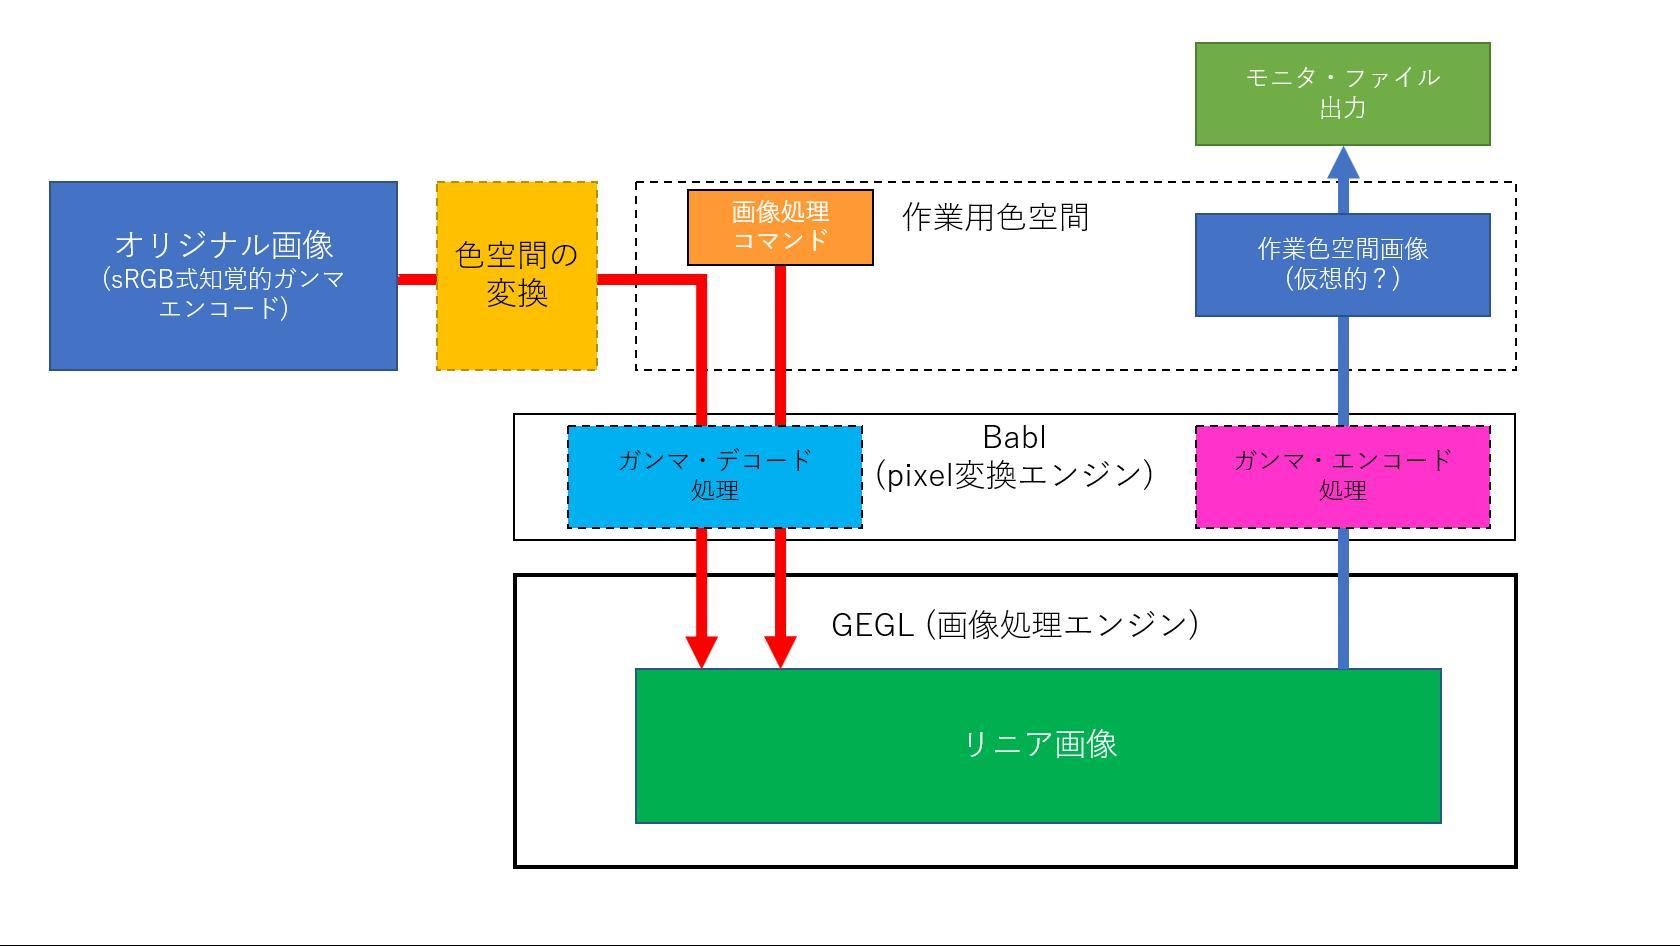 f:id:yasuo_ssi:20201126121933j:plain